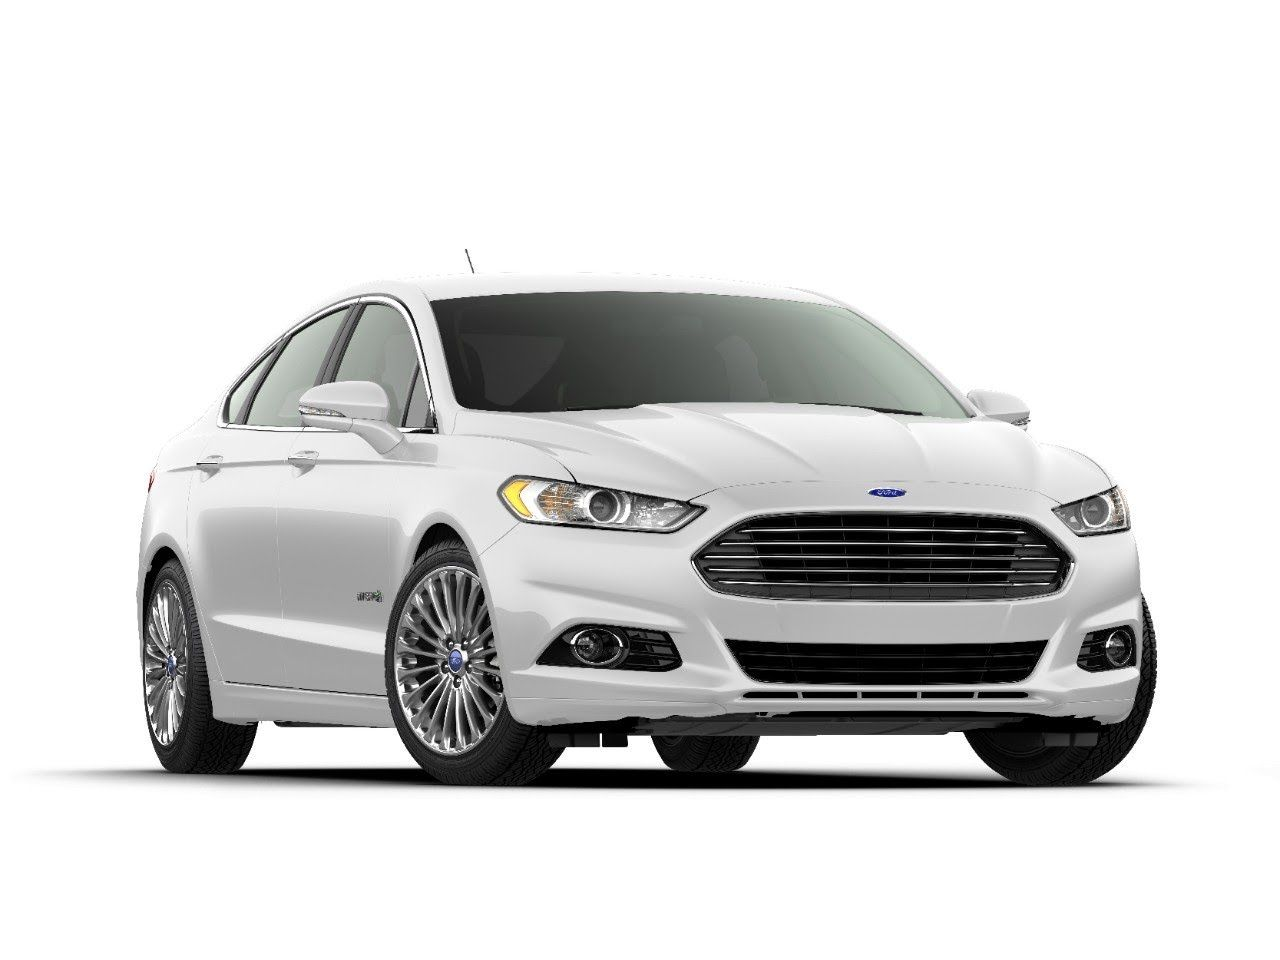 2016 Ford Fusion Hybrid Sedan Body Styles Hd Wallpaper 1280 720